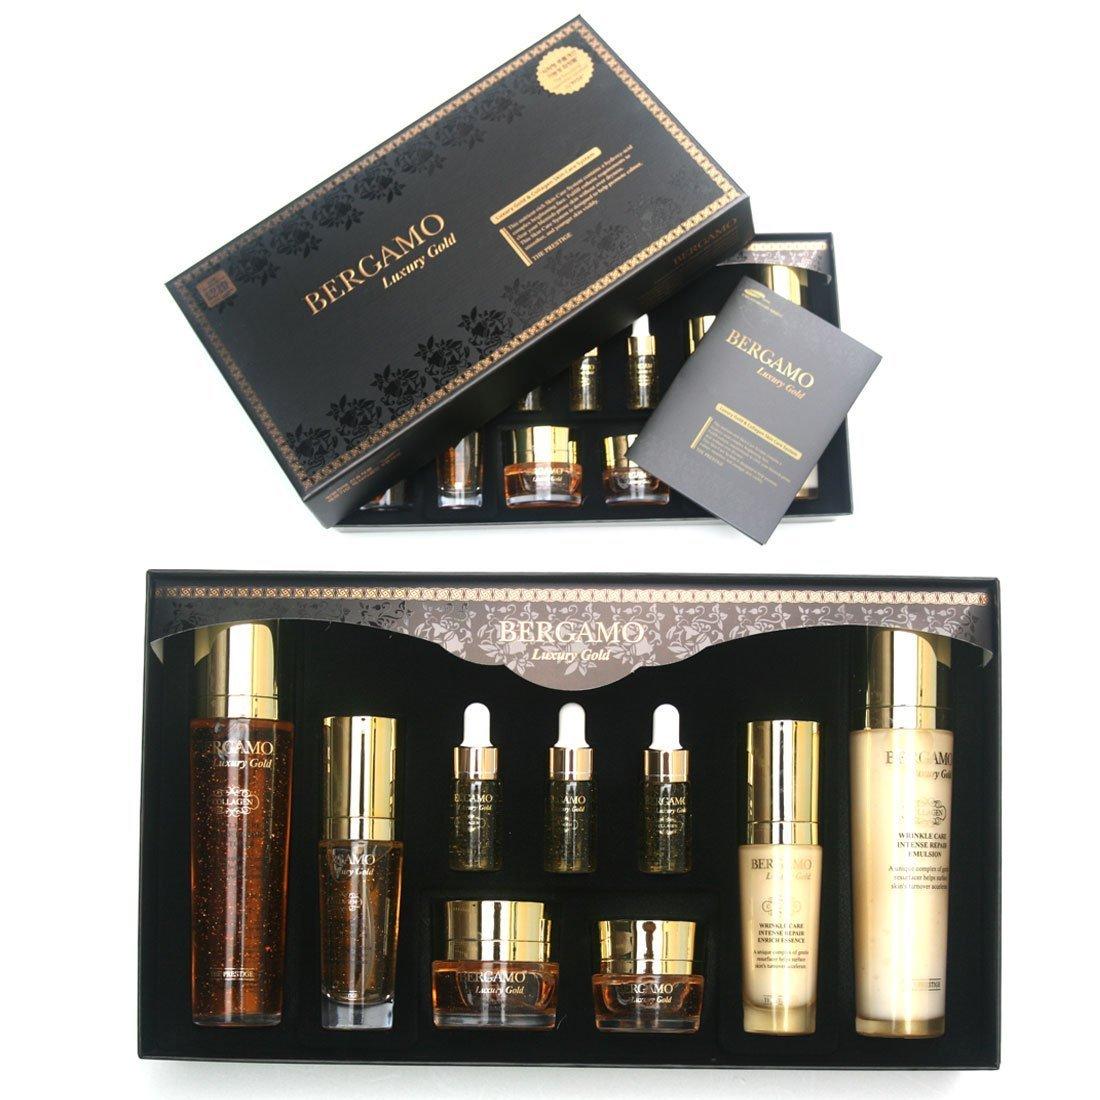 Bergamo Bergamo luxury gold collagen 9-piece gift for set all skin type, 9 Count